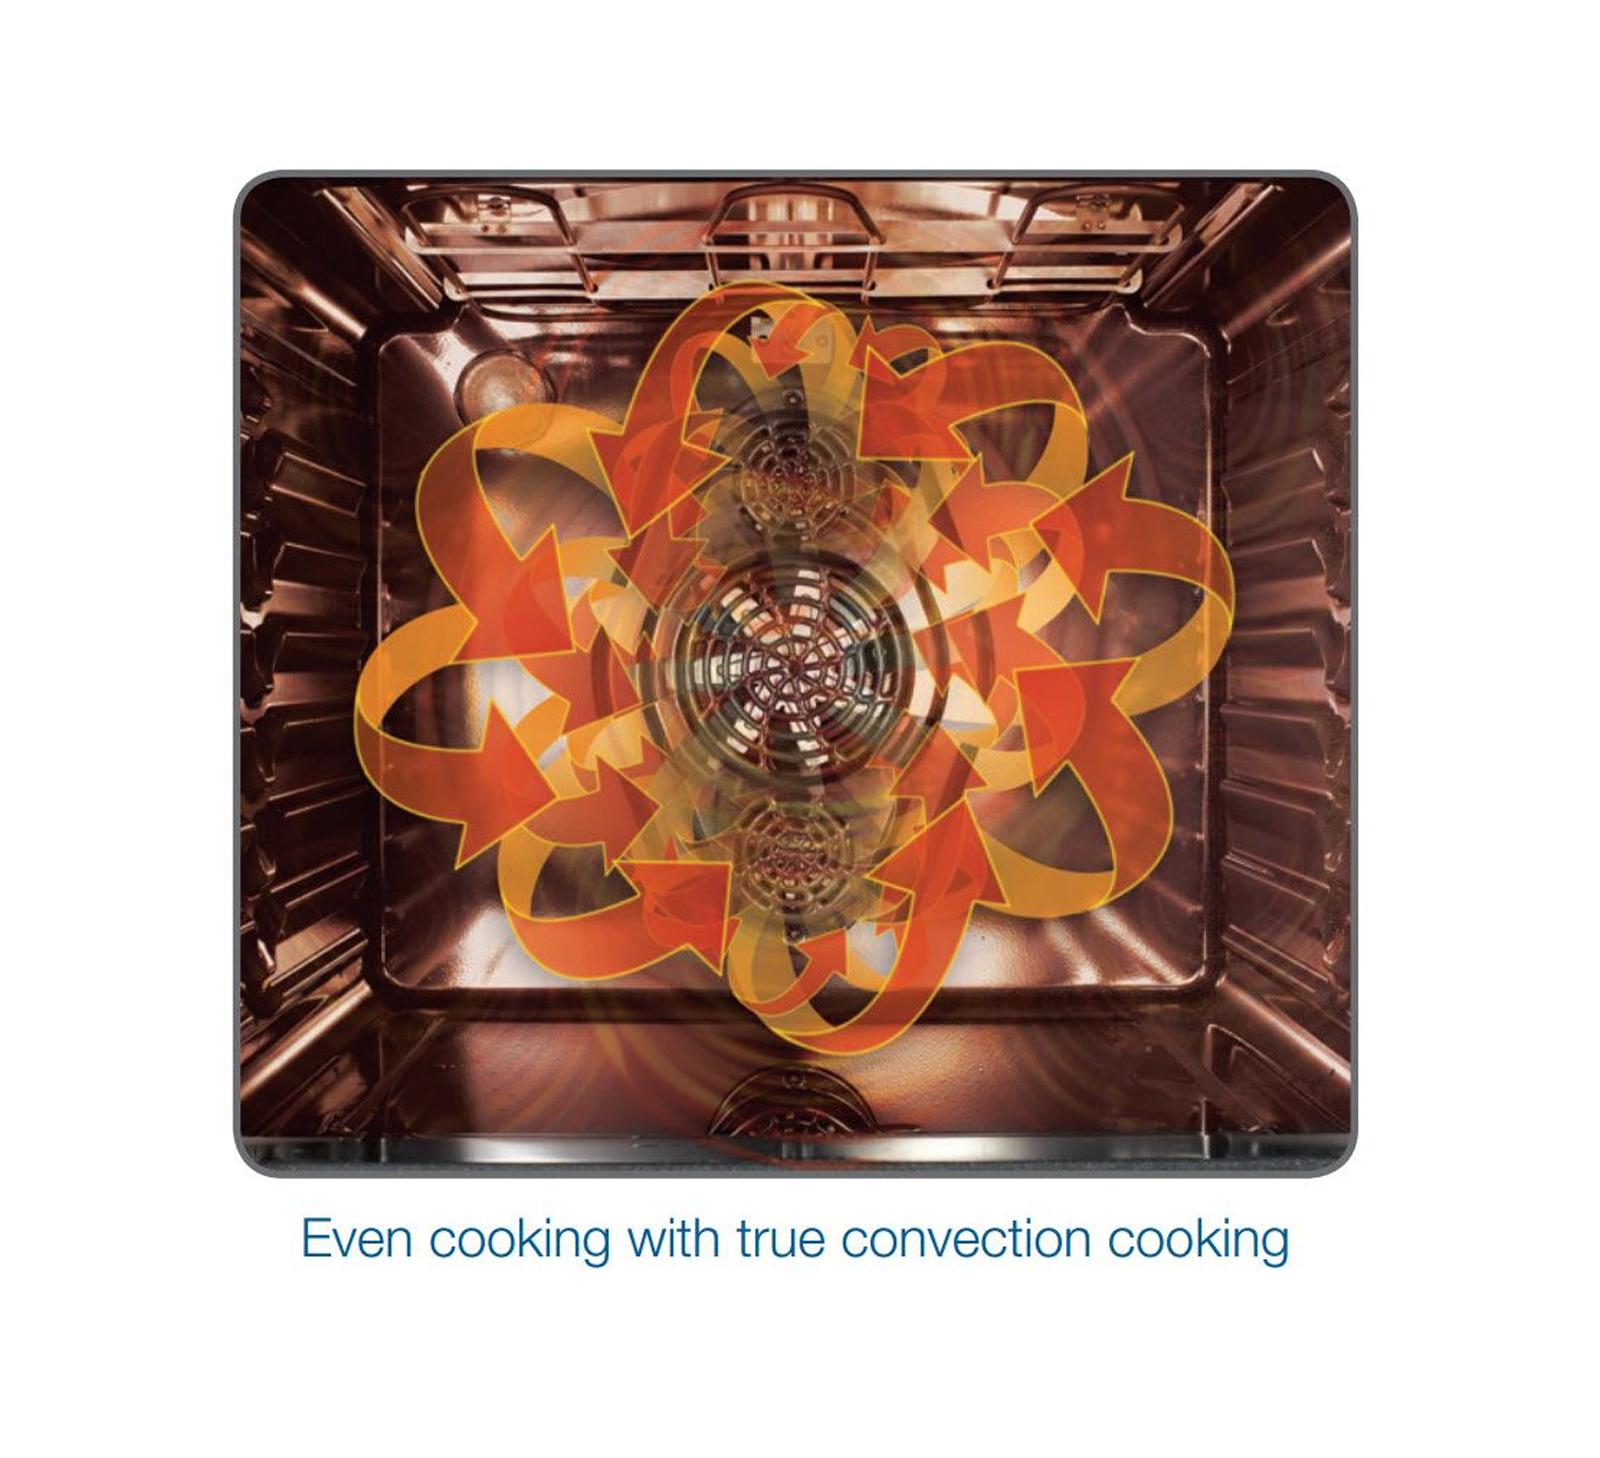 Samsung 5.8 cu. ft. Freestanding Gas Range - Stainless Steel